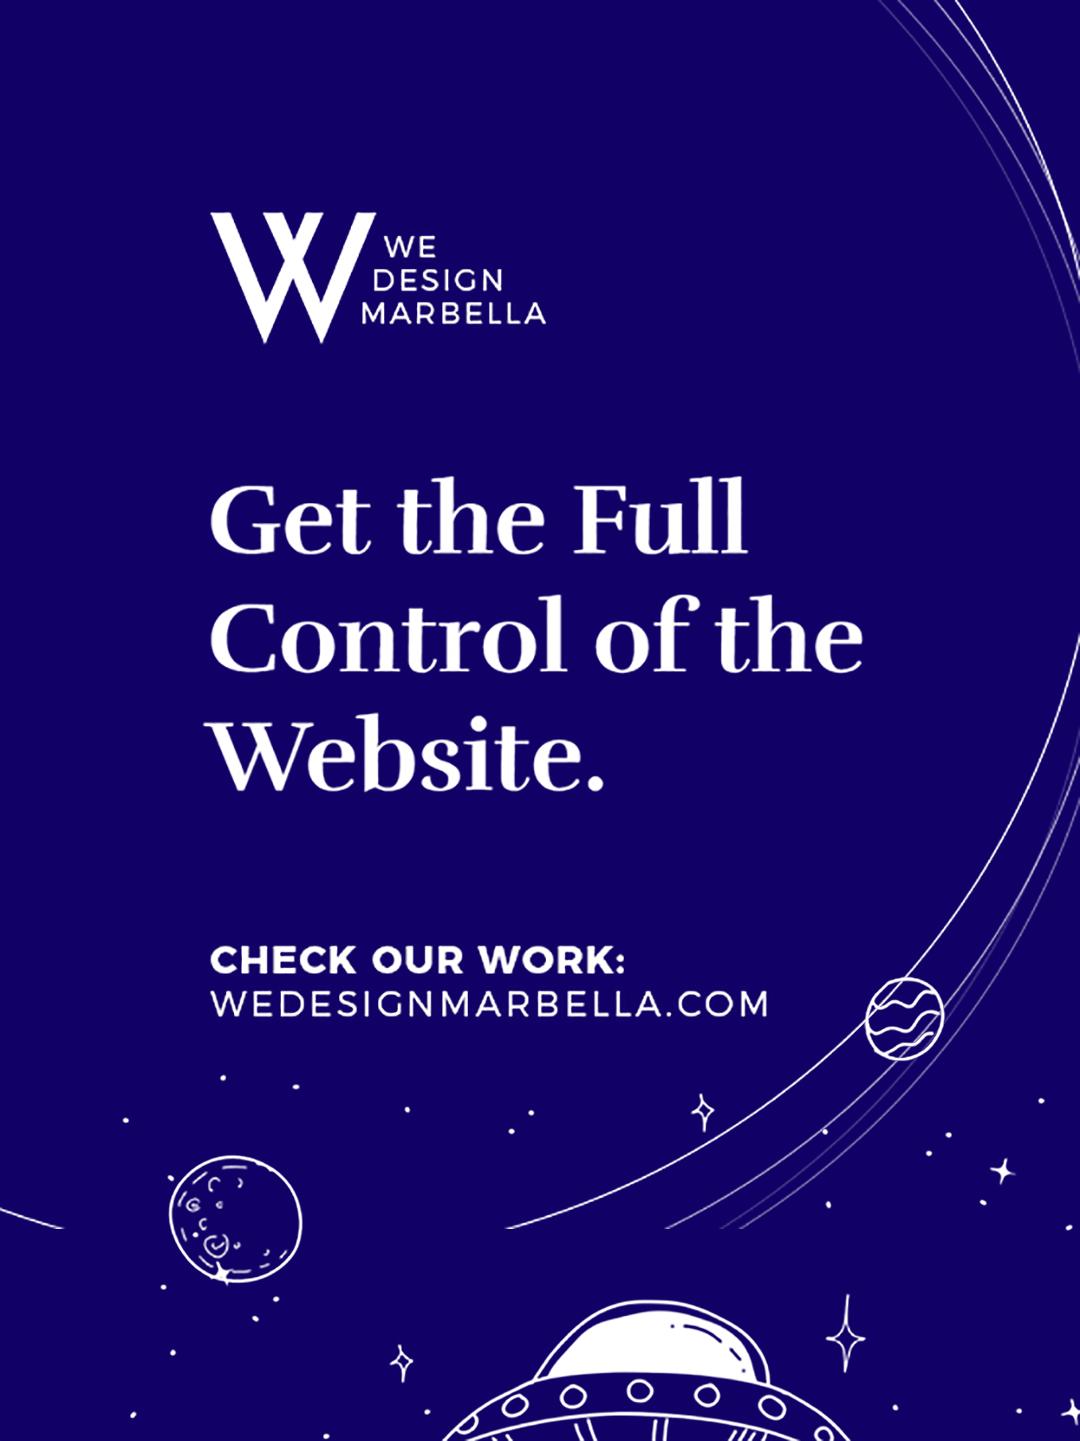 We Design Marbella